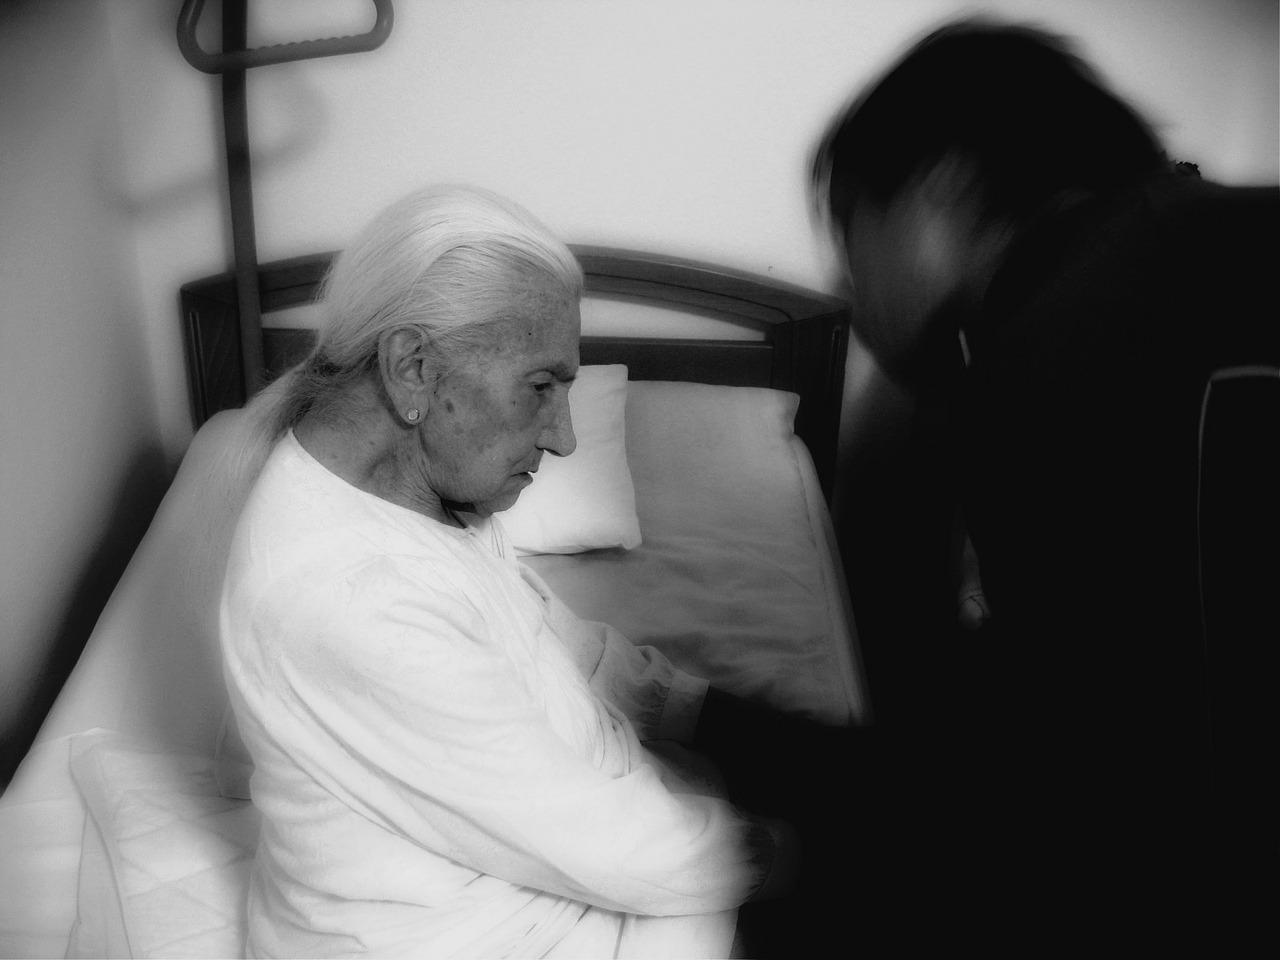 alzheimer-ability channel-alzheimer sintomi-demenza senile-sintomi alzheimer-morbo di alzheimer-alzheimer precoce-alzheimer sintomi iniziali-cura alzheimer-alzheimer sintomi finali-malattia alzheimer